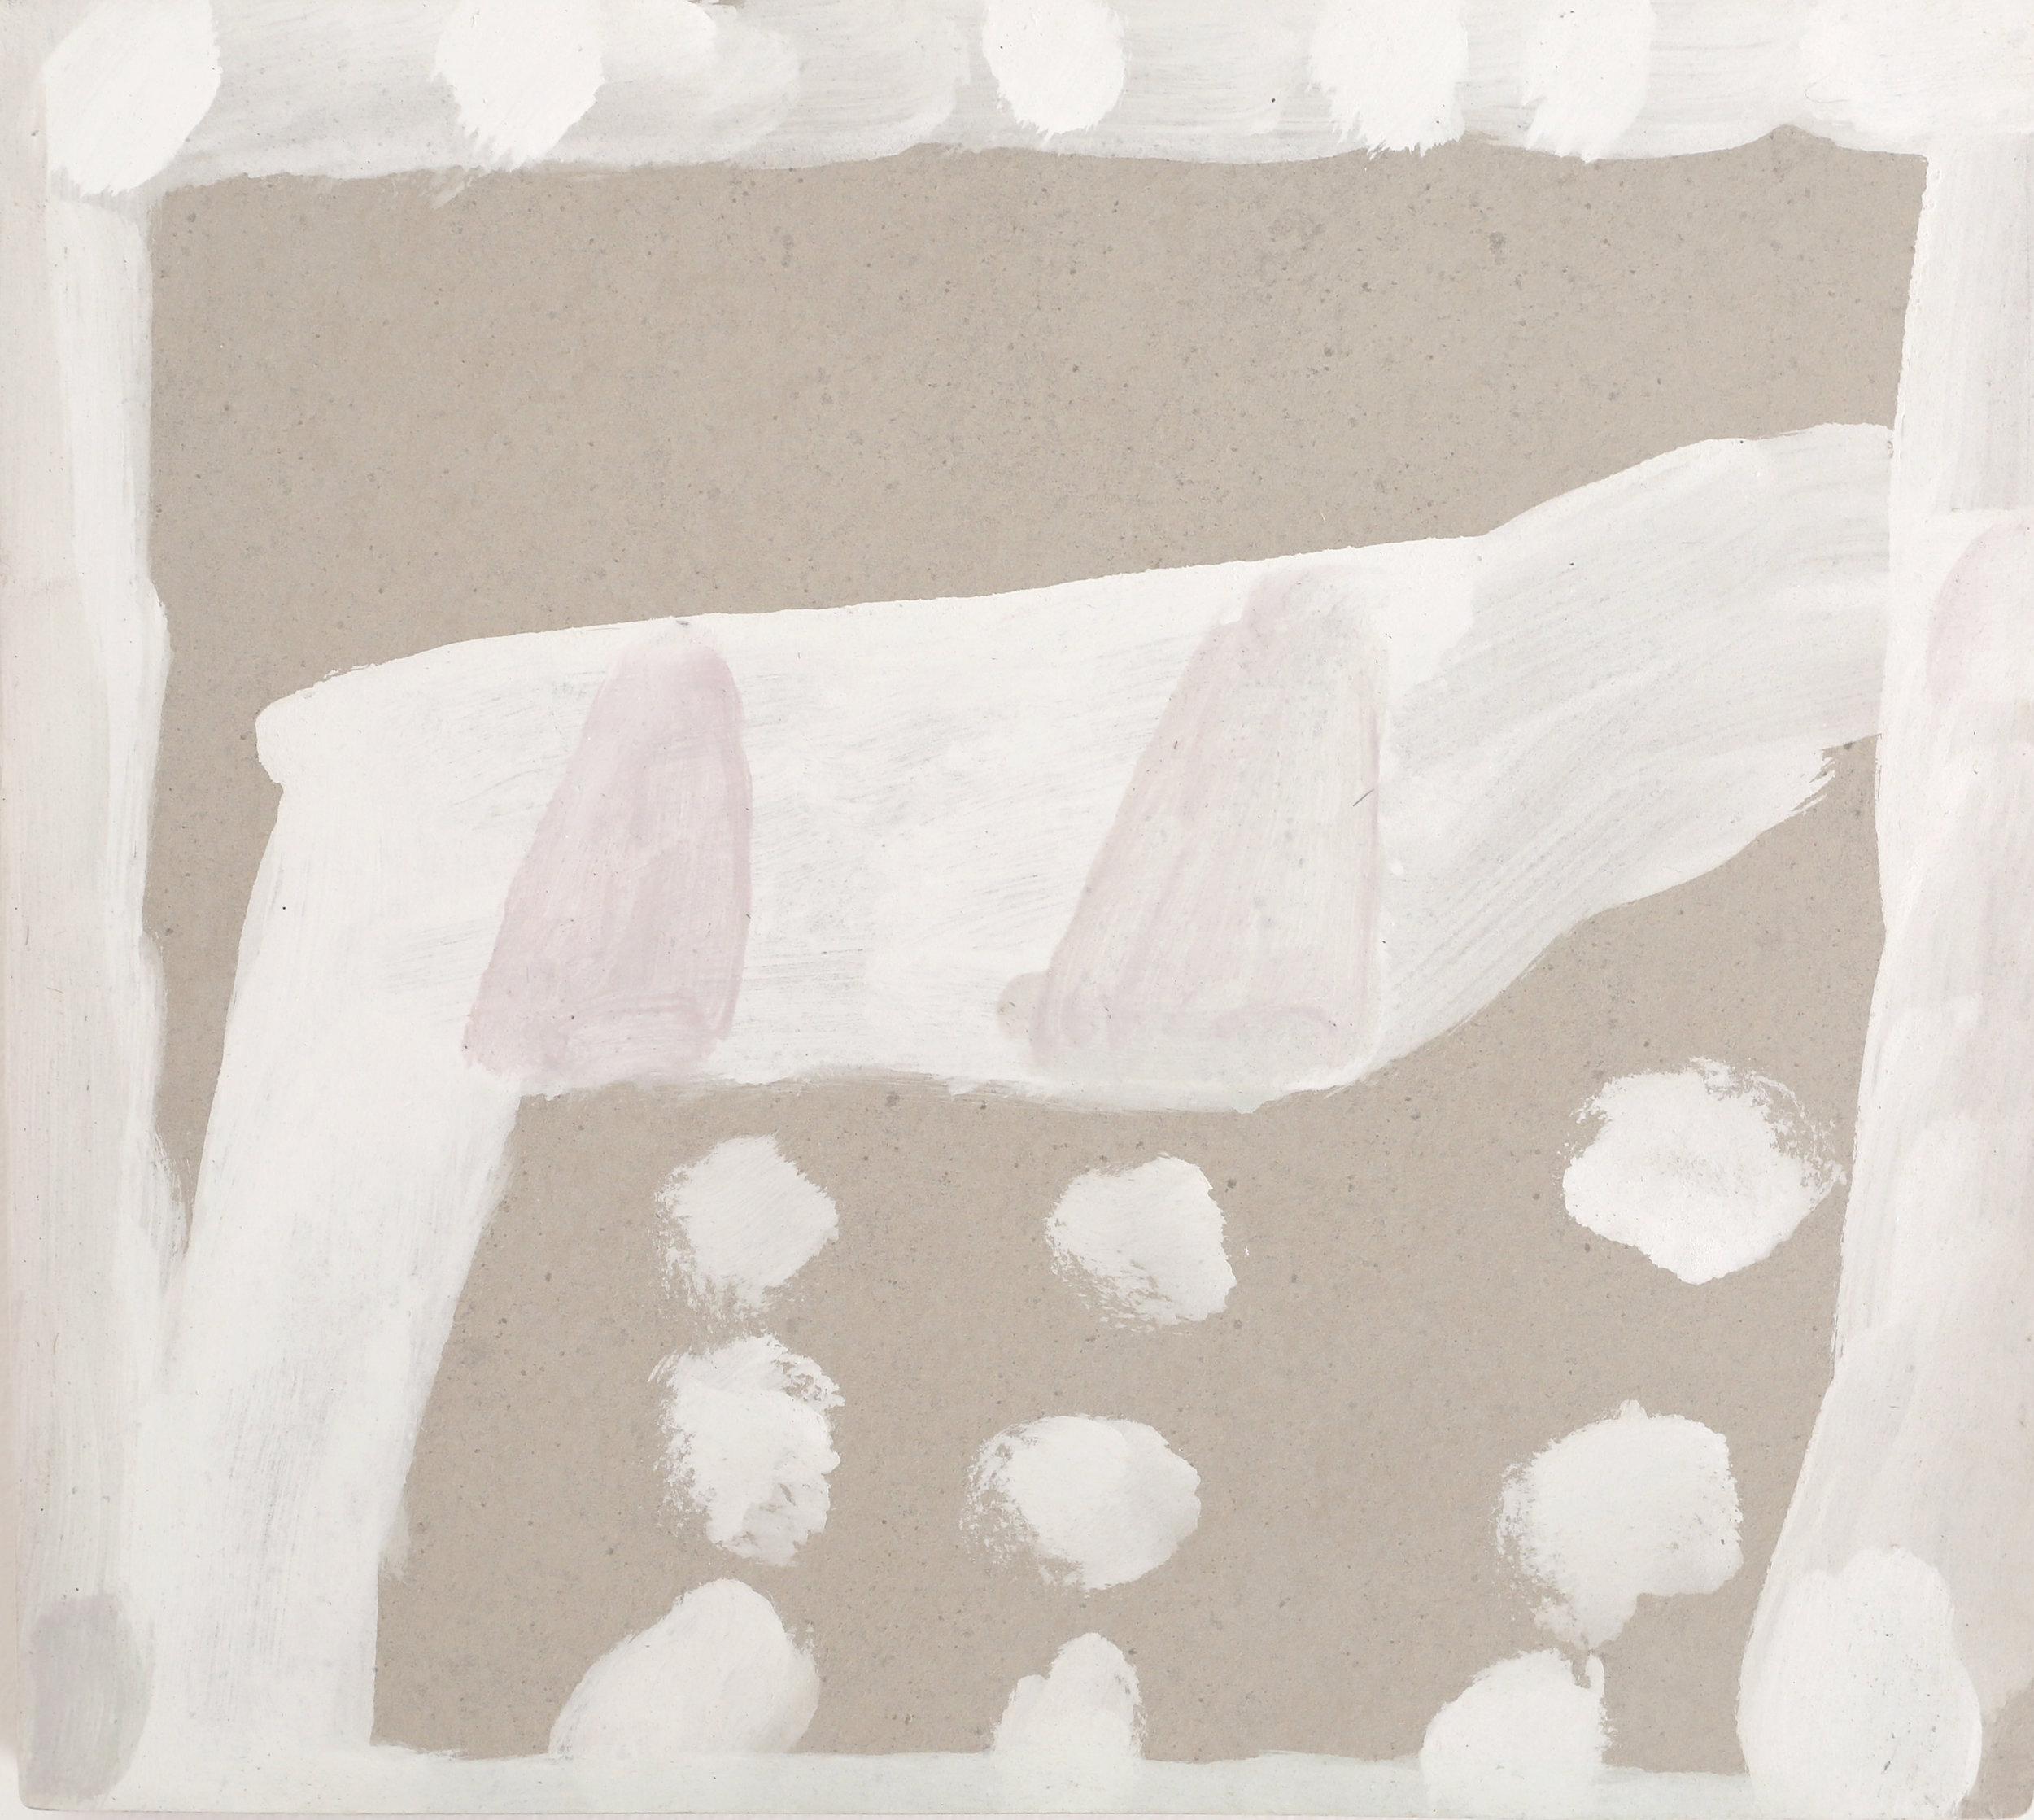 STEVEN HARVEY  Unrendered Room - Wingecarribee 1 , 2016 acrylic on compressed cement 40 x 45 cm